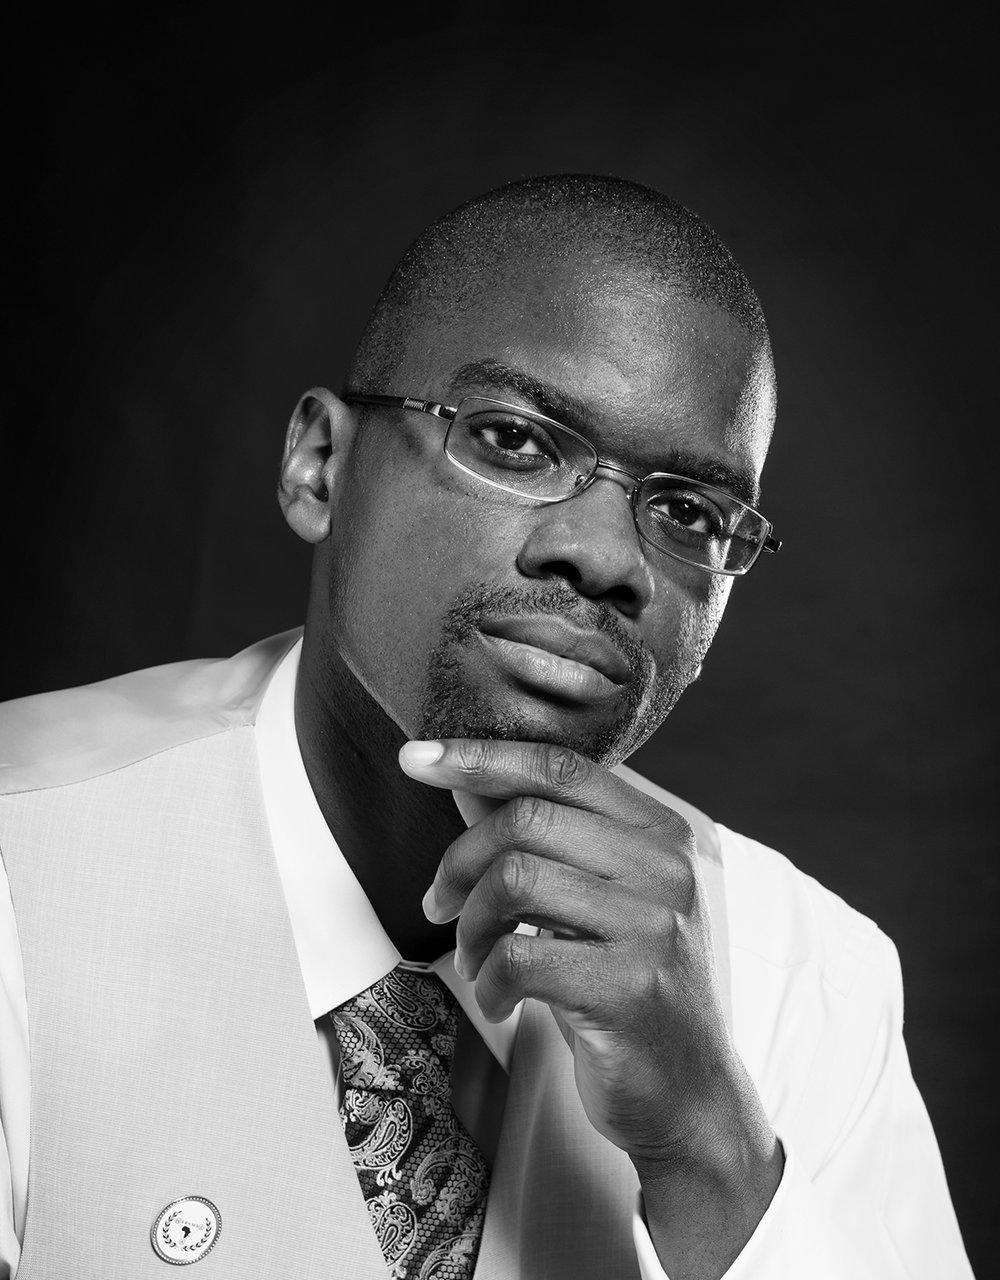 Okendo Lewis-Gayle, Chairman, Harambe Entrepreneur Alliance